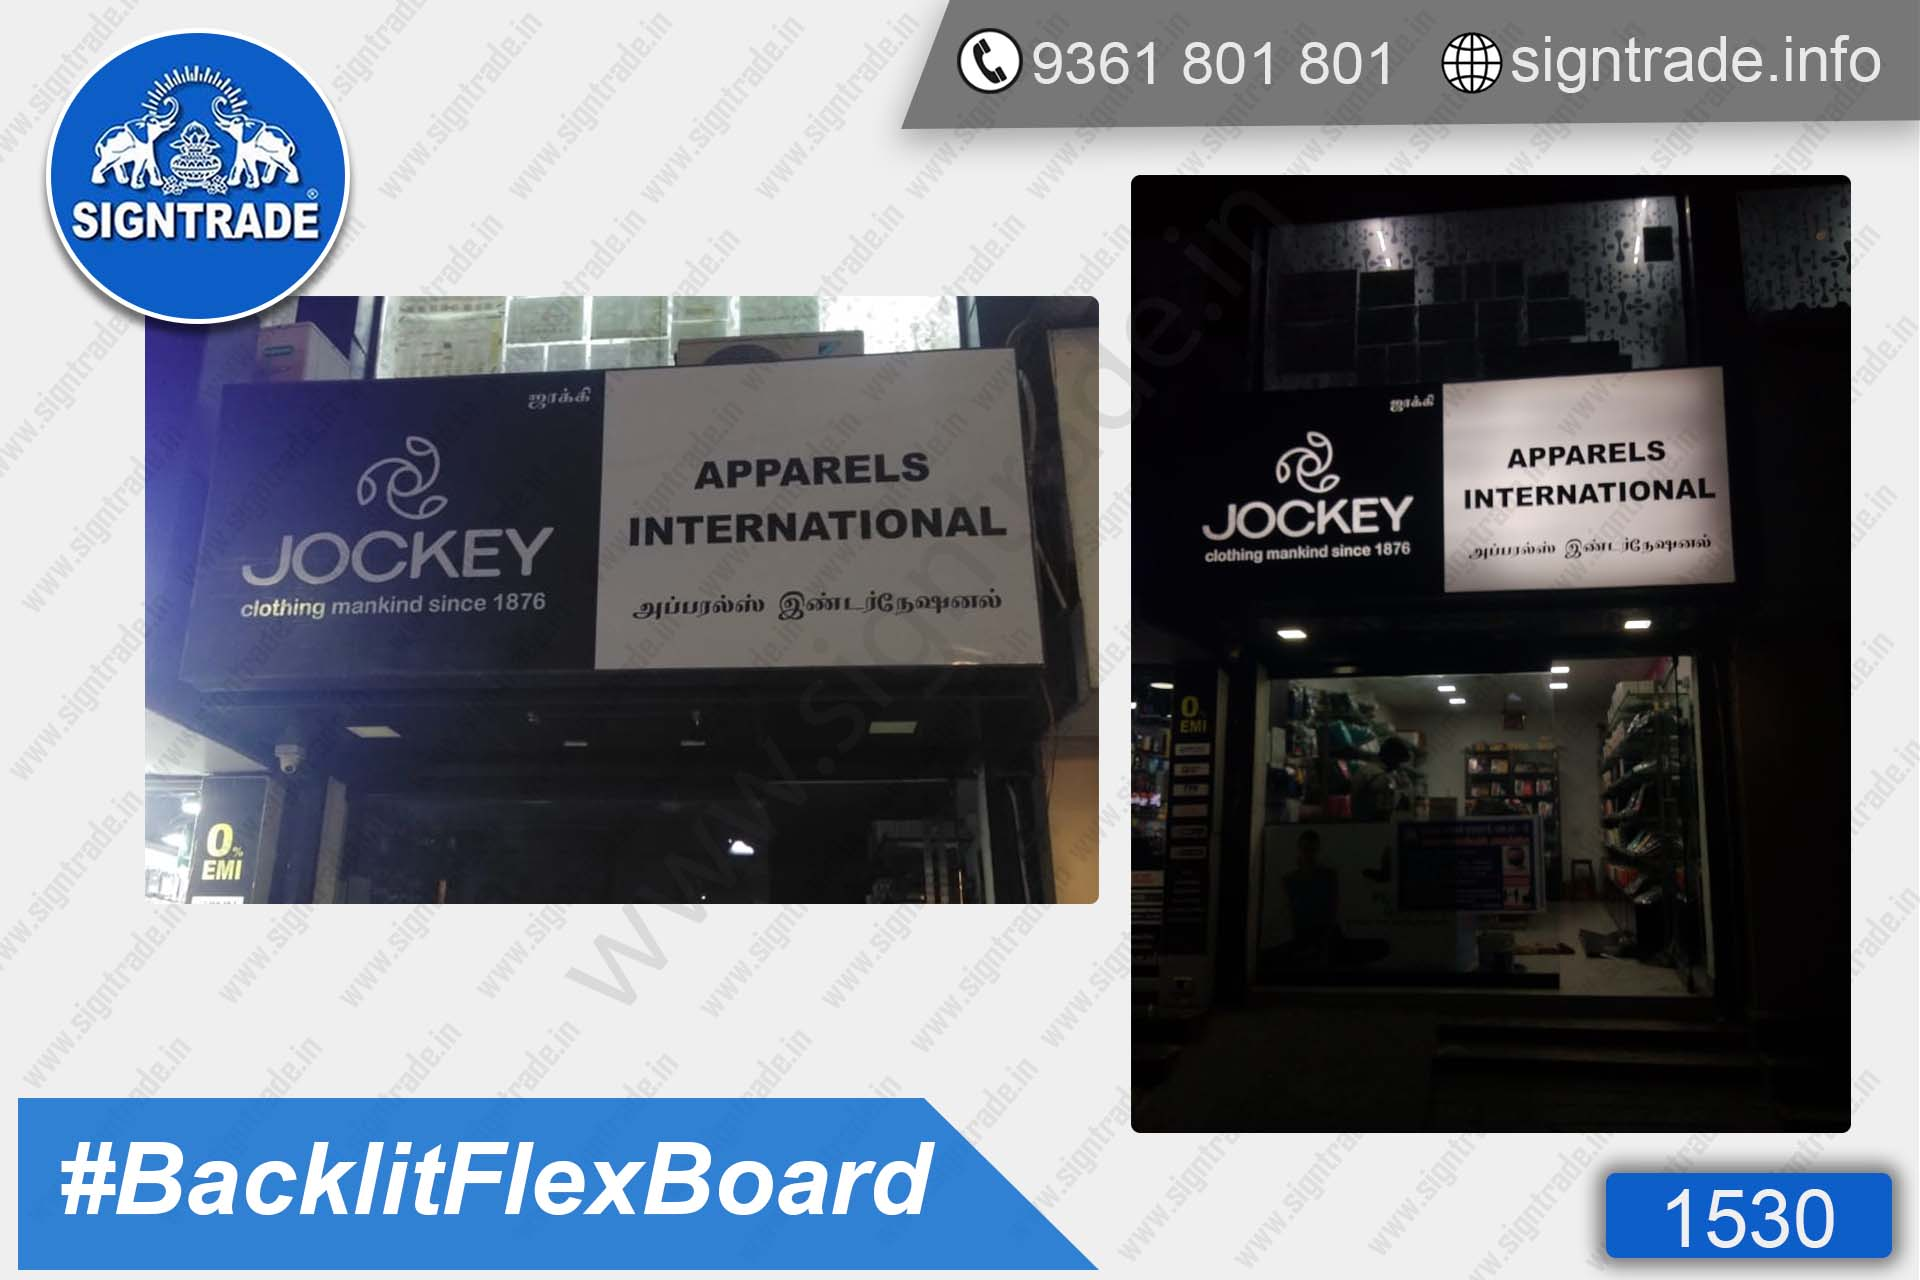 Jockey Apparel - Velachery - Chennai - SIGNTRADE - Digital Printing Service, Backlit Flex Board Manufacturers in Chennai